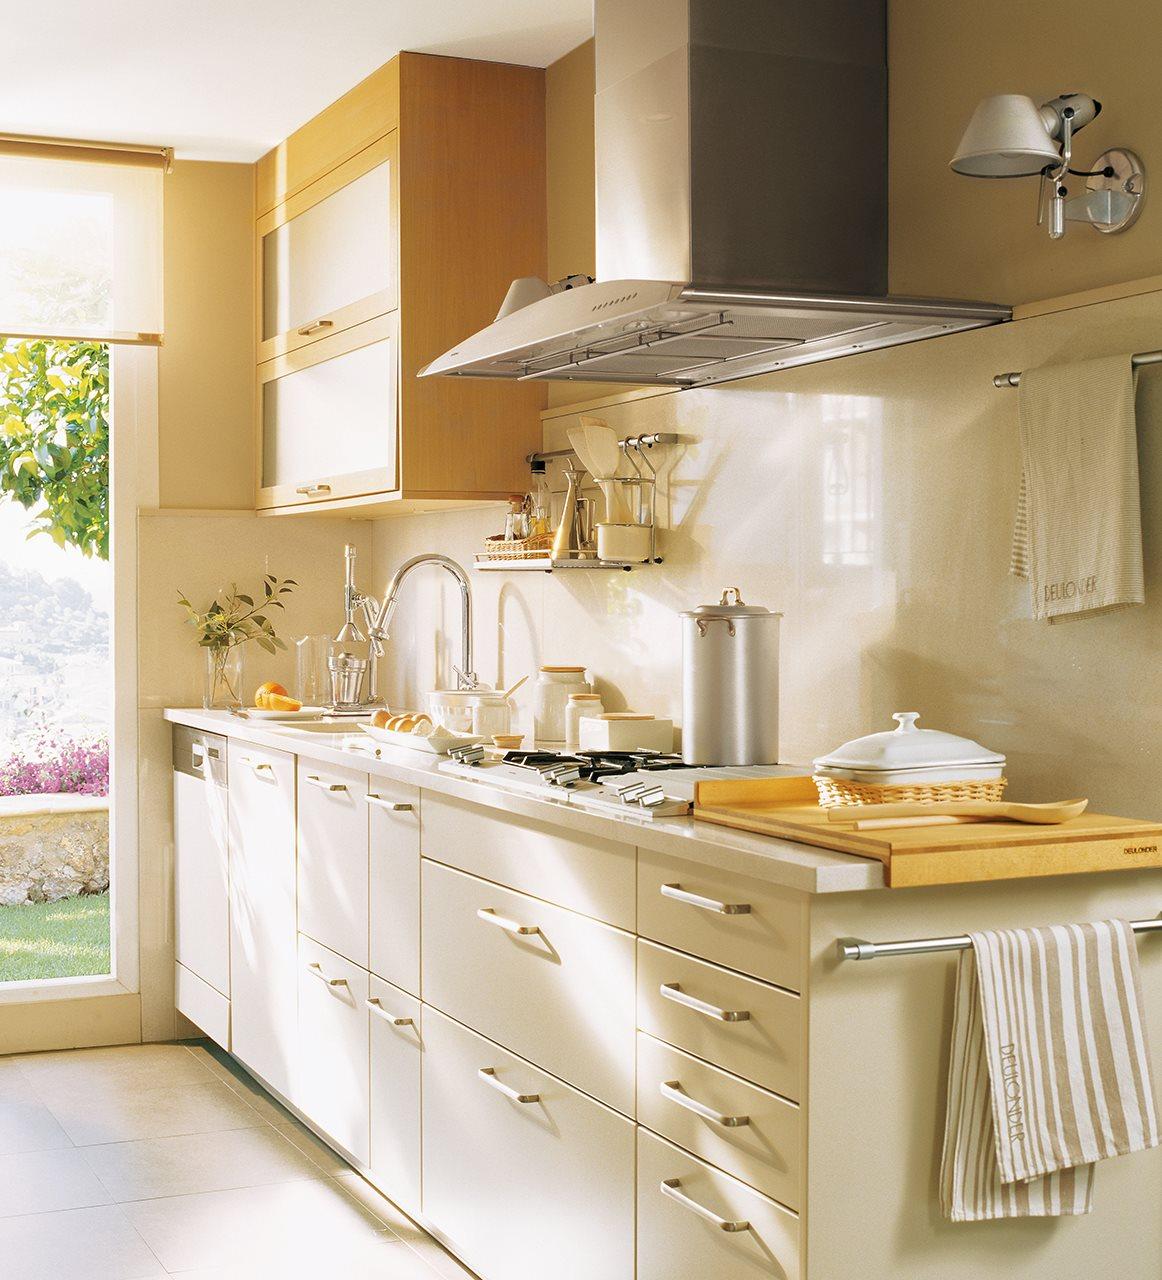 Cocinas para vivir en familia for Muebles cocina chica